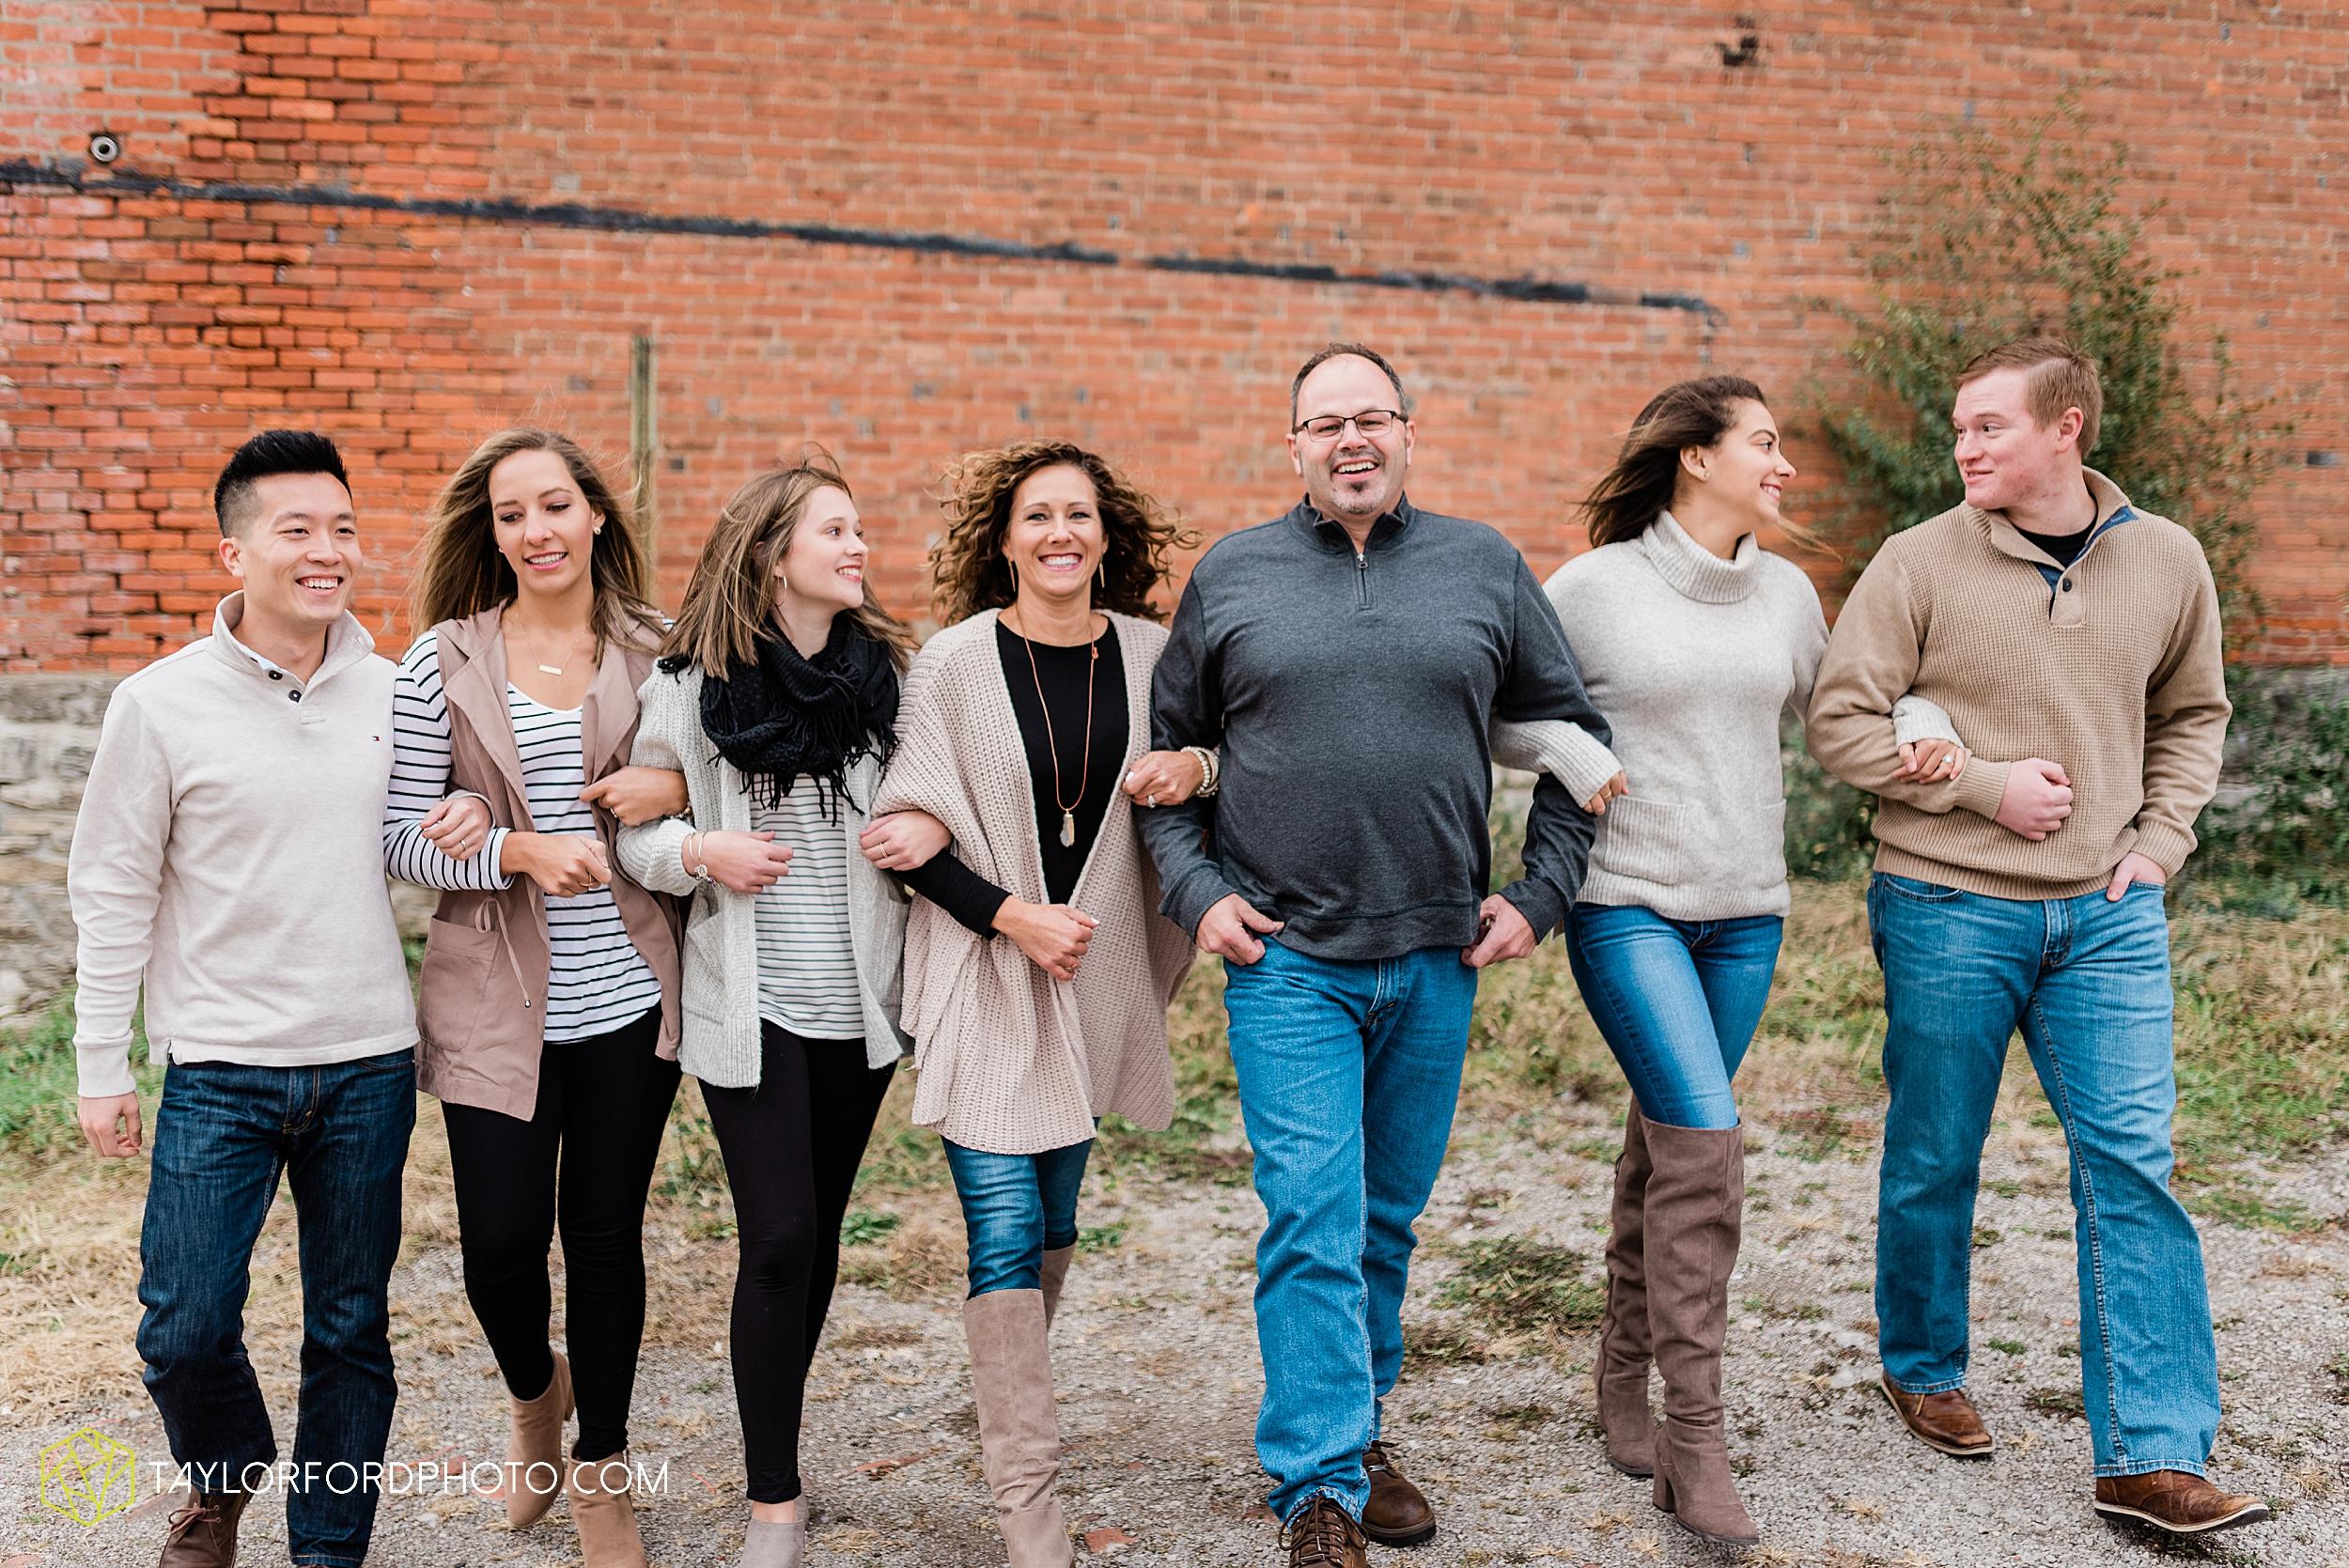 downtown-van-wert-ohio-fall-family-photographer-taylor-ford-hirschy-photographer_1642.jpg